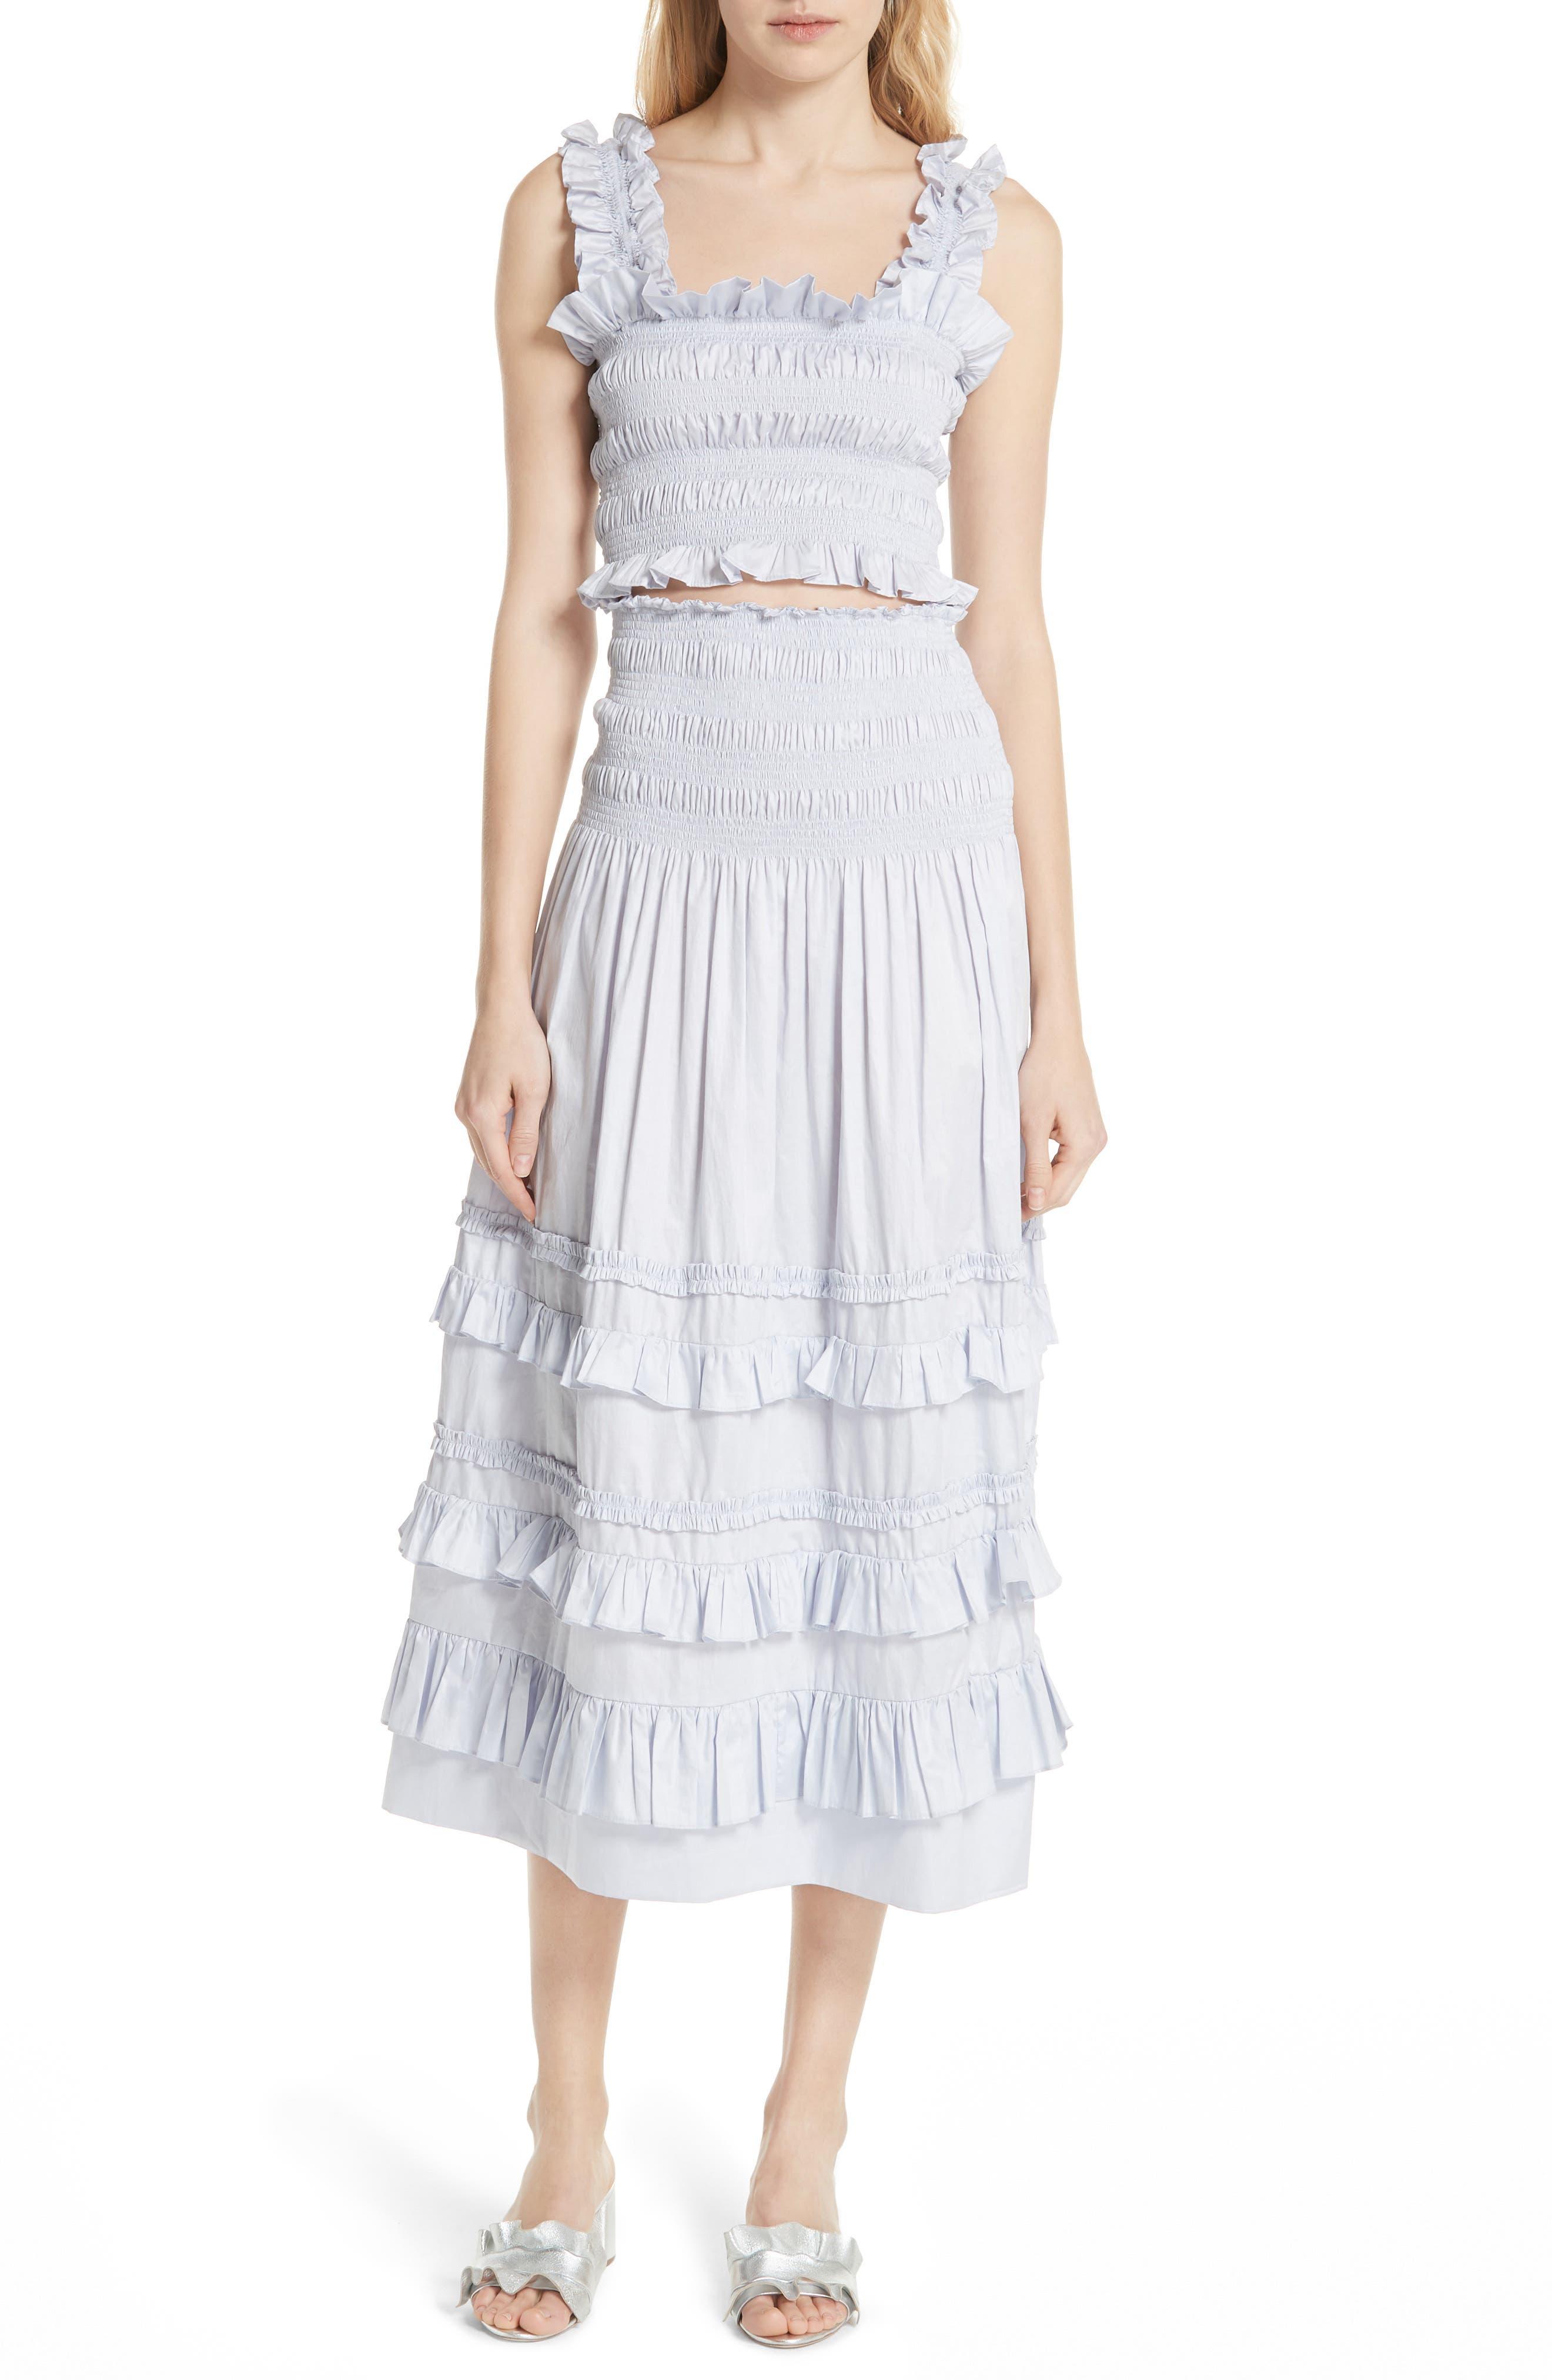 REBECCA TAYLOR, Smocked Sleeveless Cotton Top, Alternate thumbnail 7, color, 458